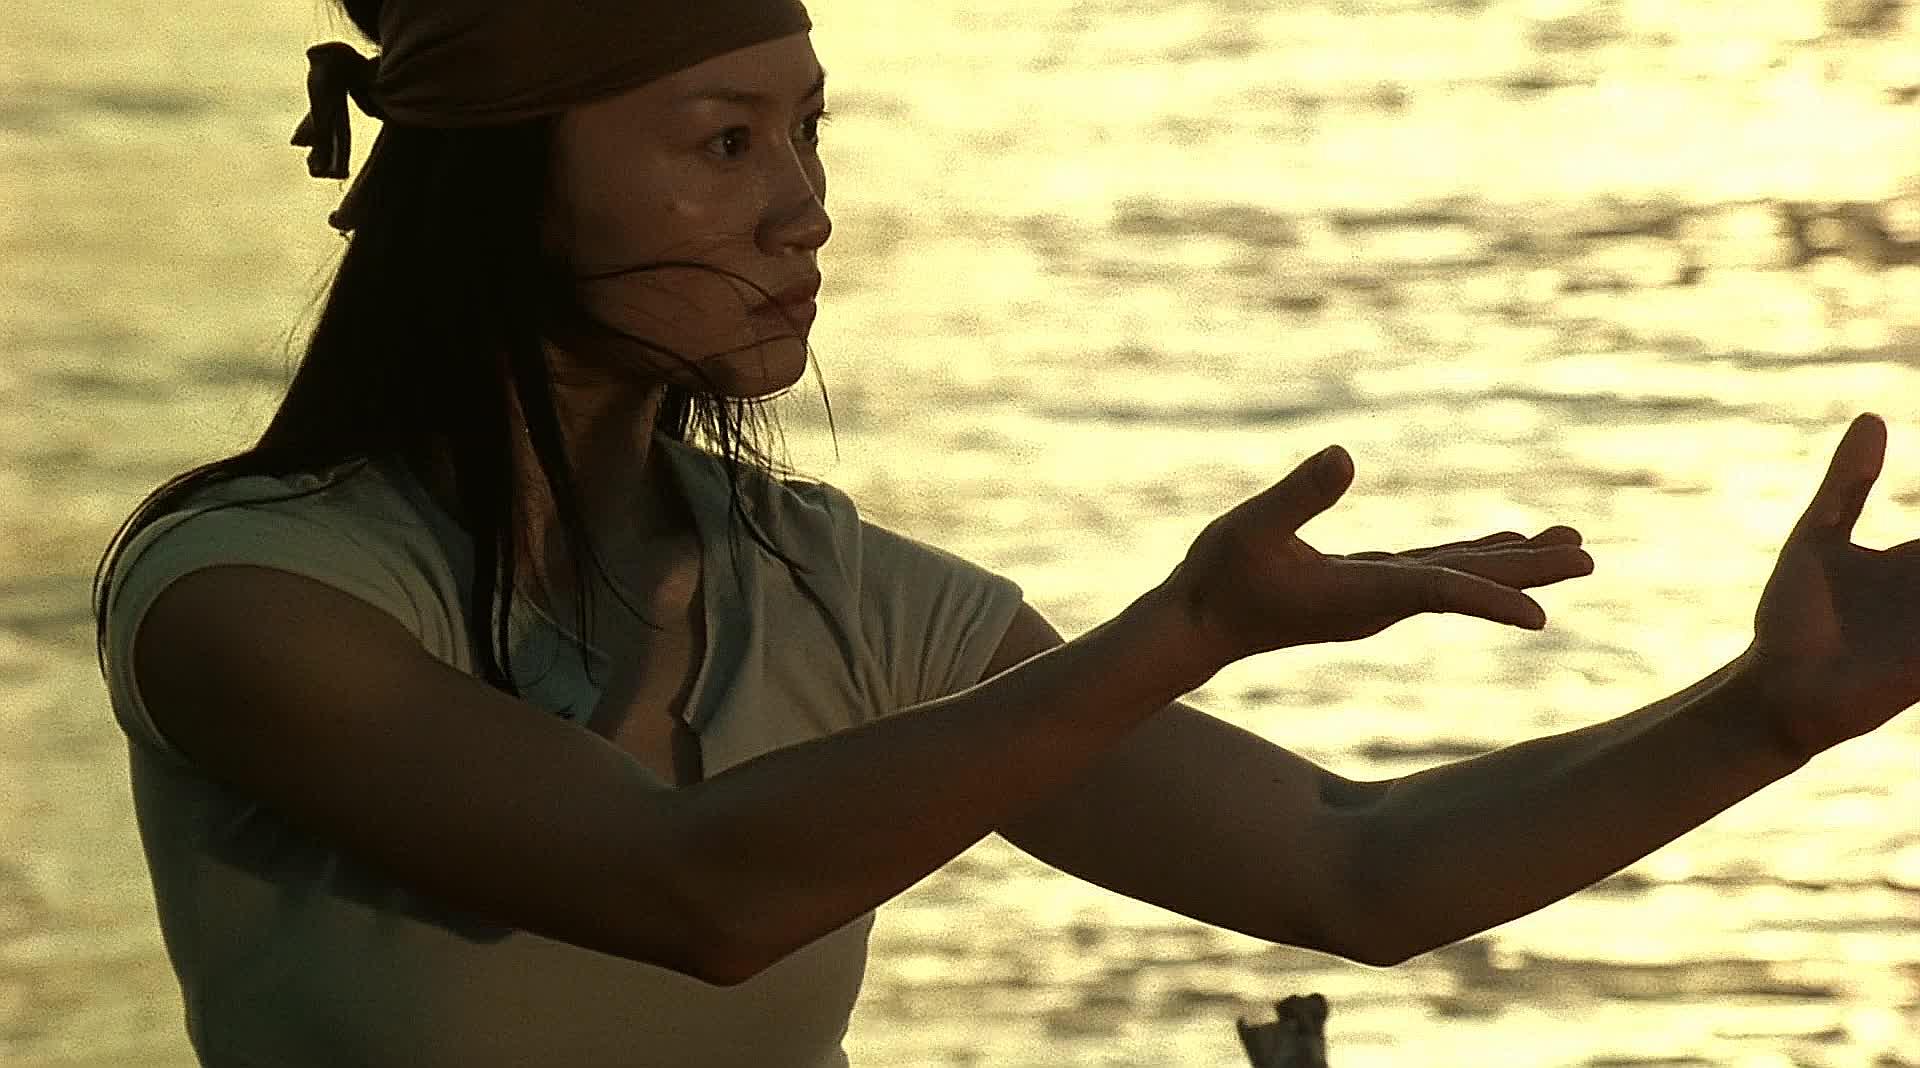 Naked Weapon (2002) Jewel Lee